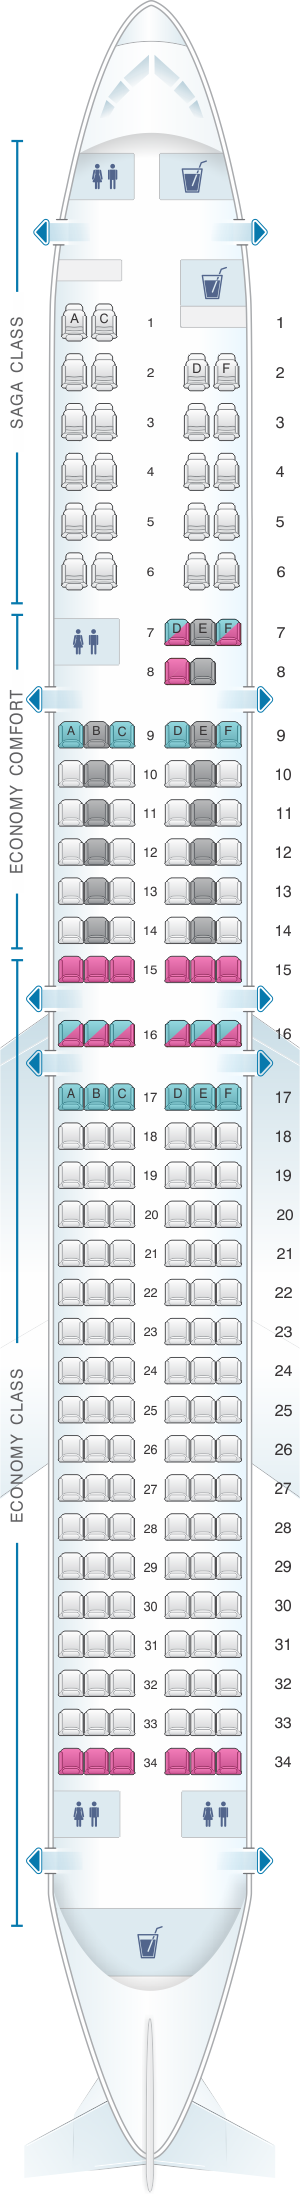 Icelandair Seat Selection Brokeasshome Com